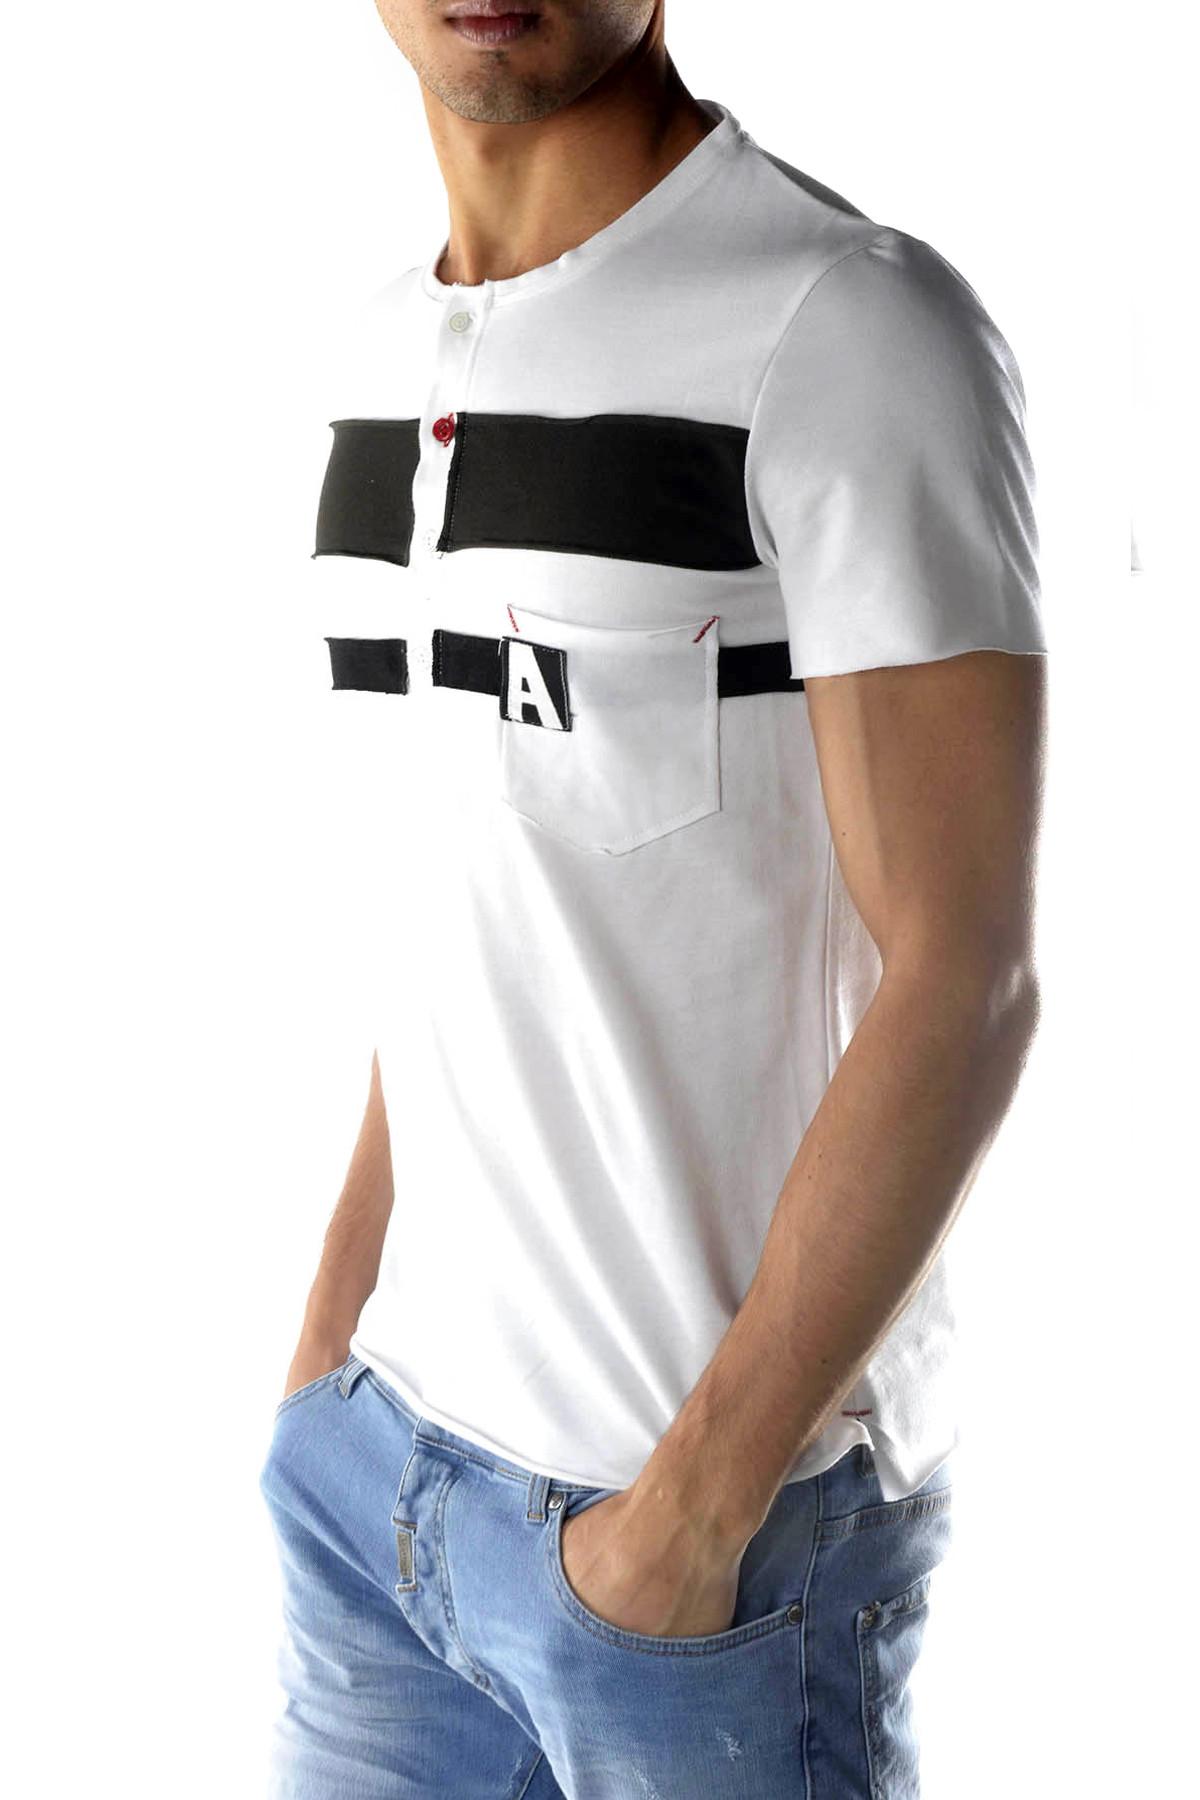 Marchio Absolut Joy Genere Uomo Tipologia T-shirt Stagione Primavera/Estate…